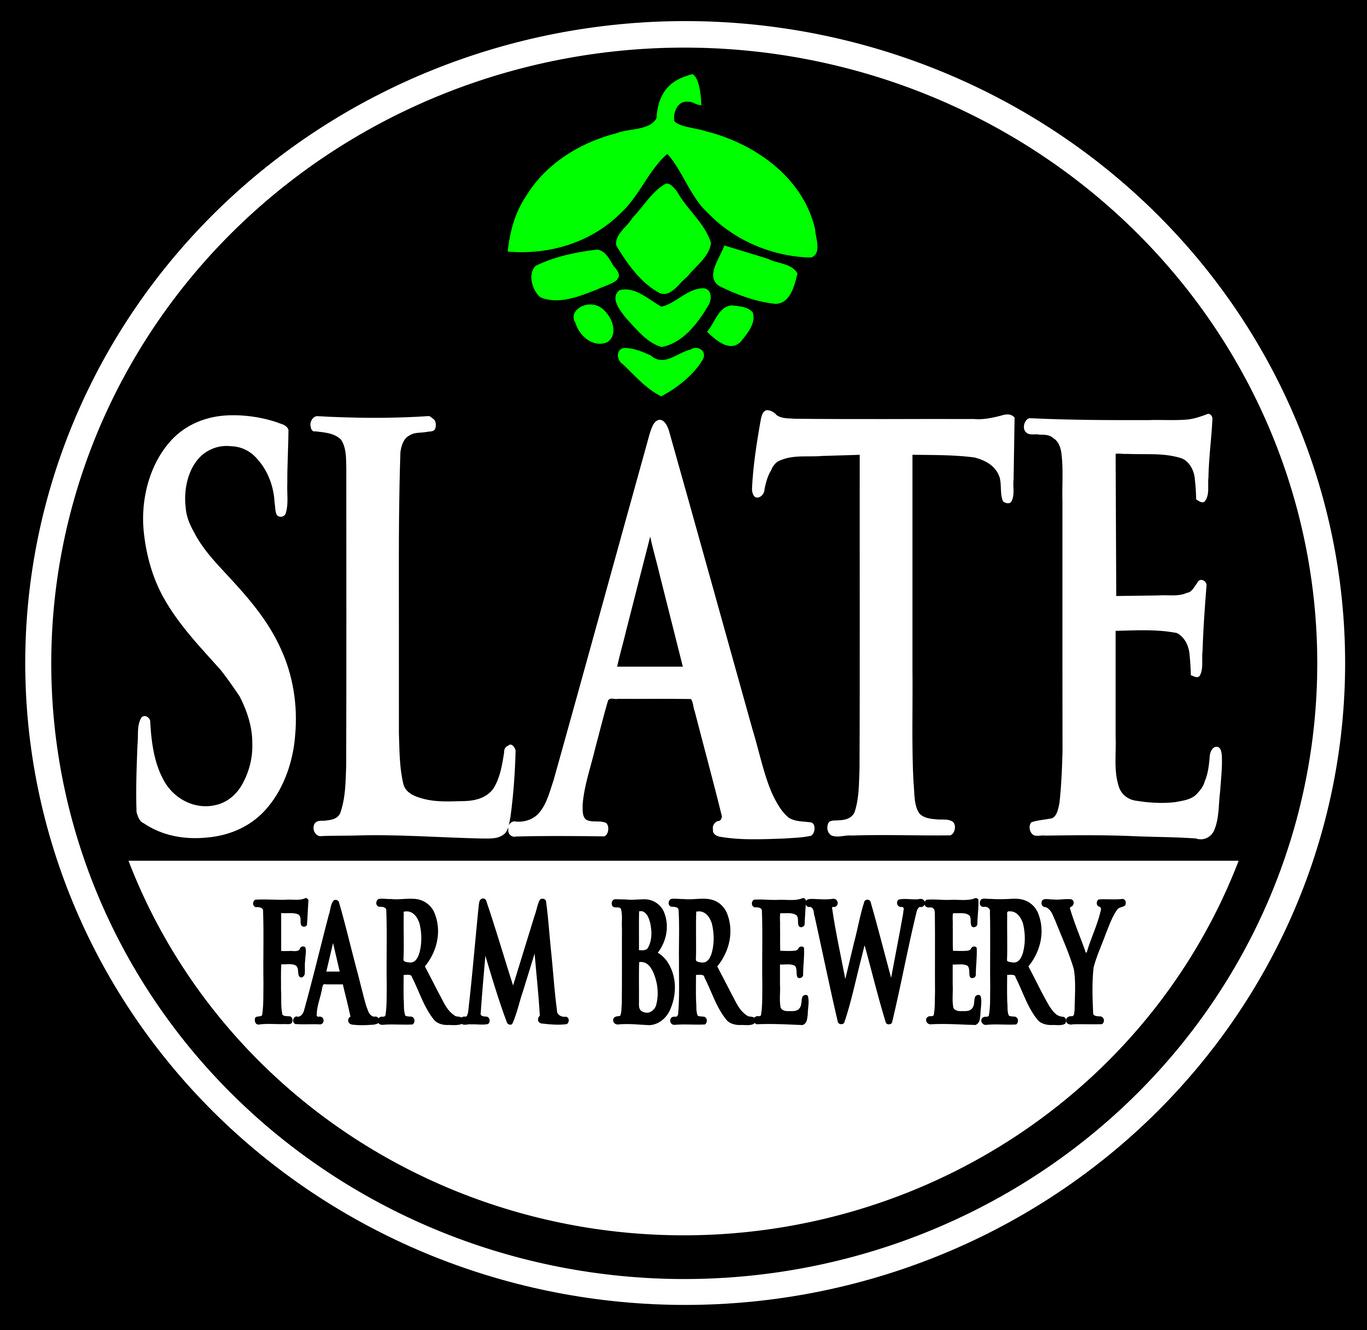 Home Slate Farm Brewery